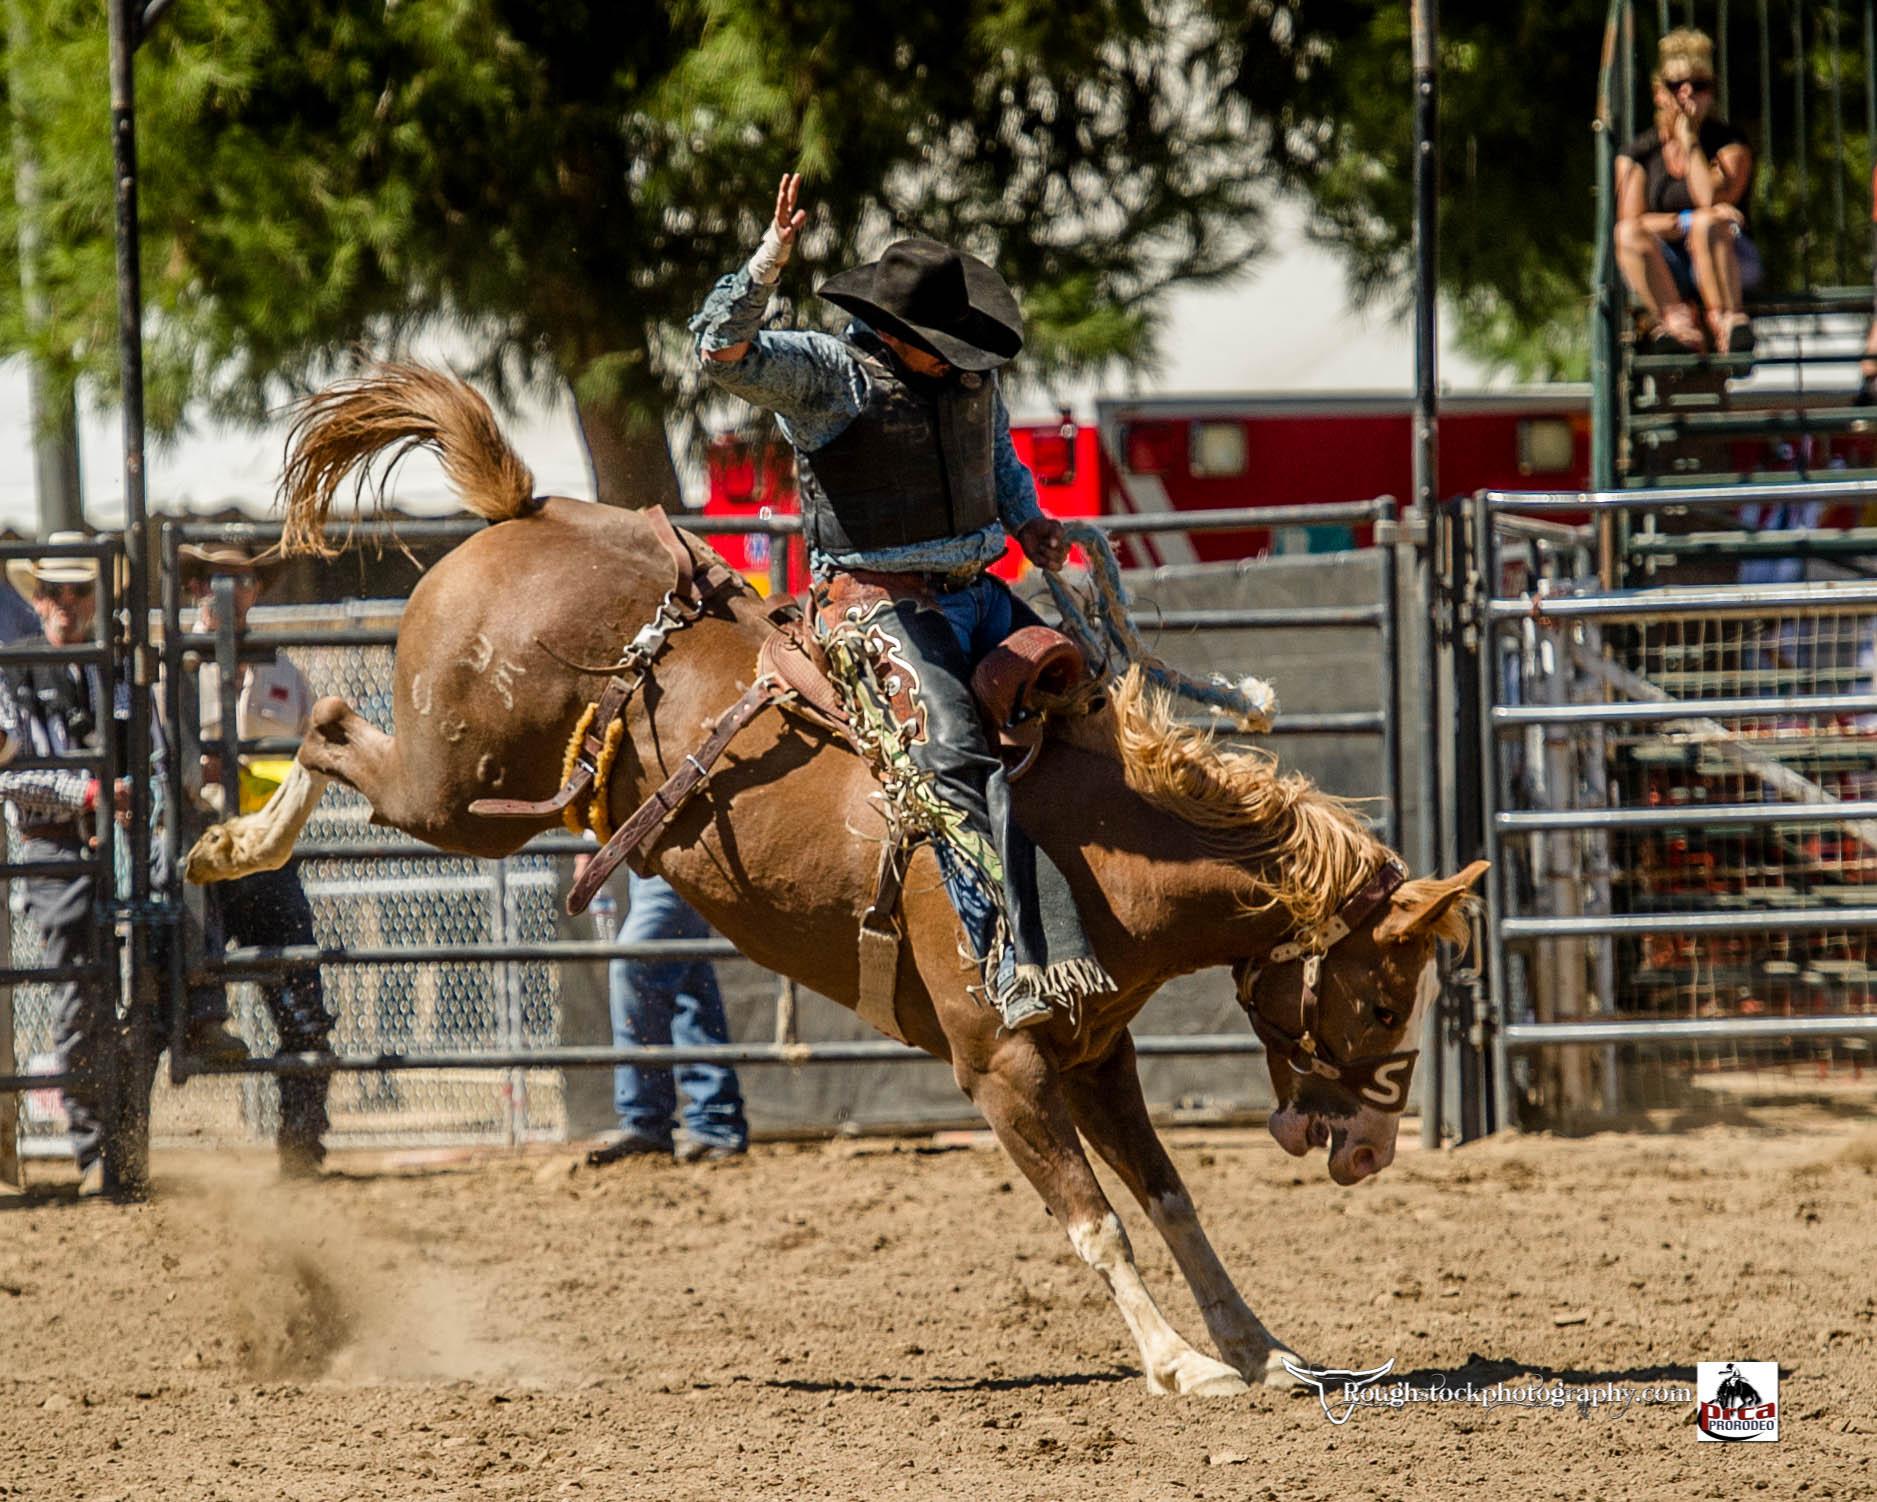 Al_Animal_Care_Poway_Rodeo.jpg